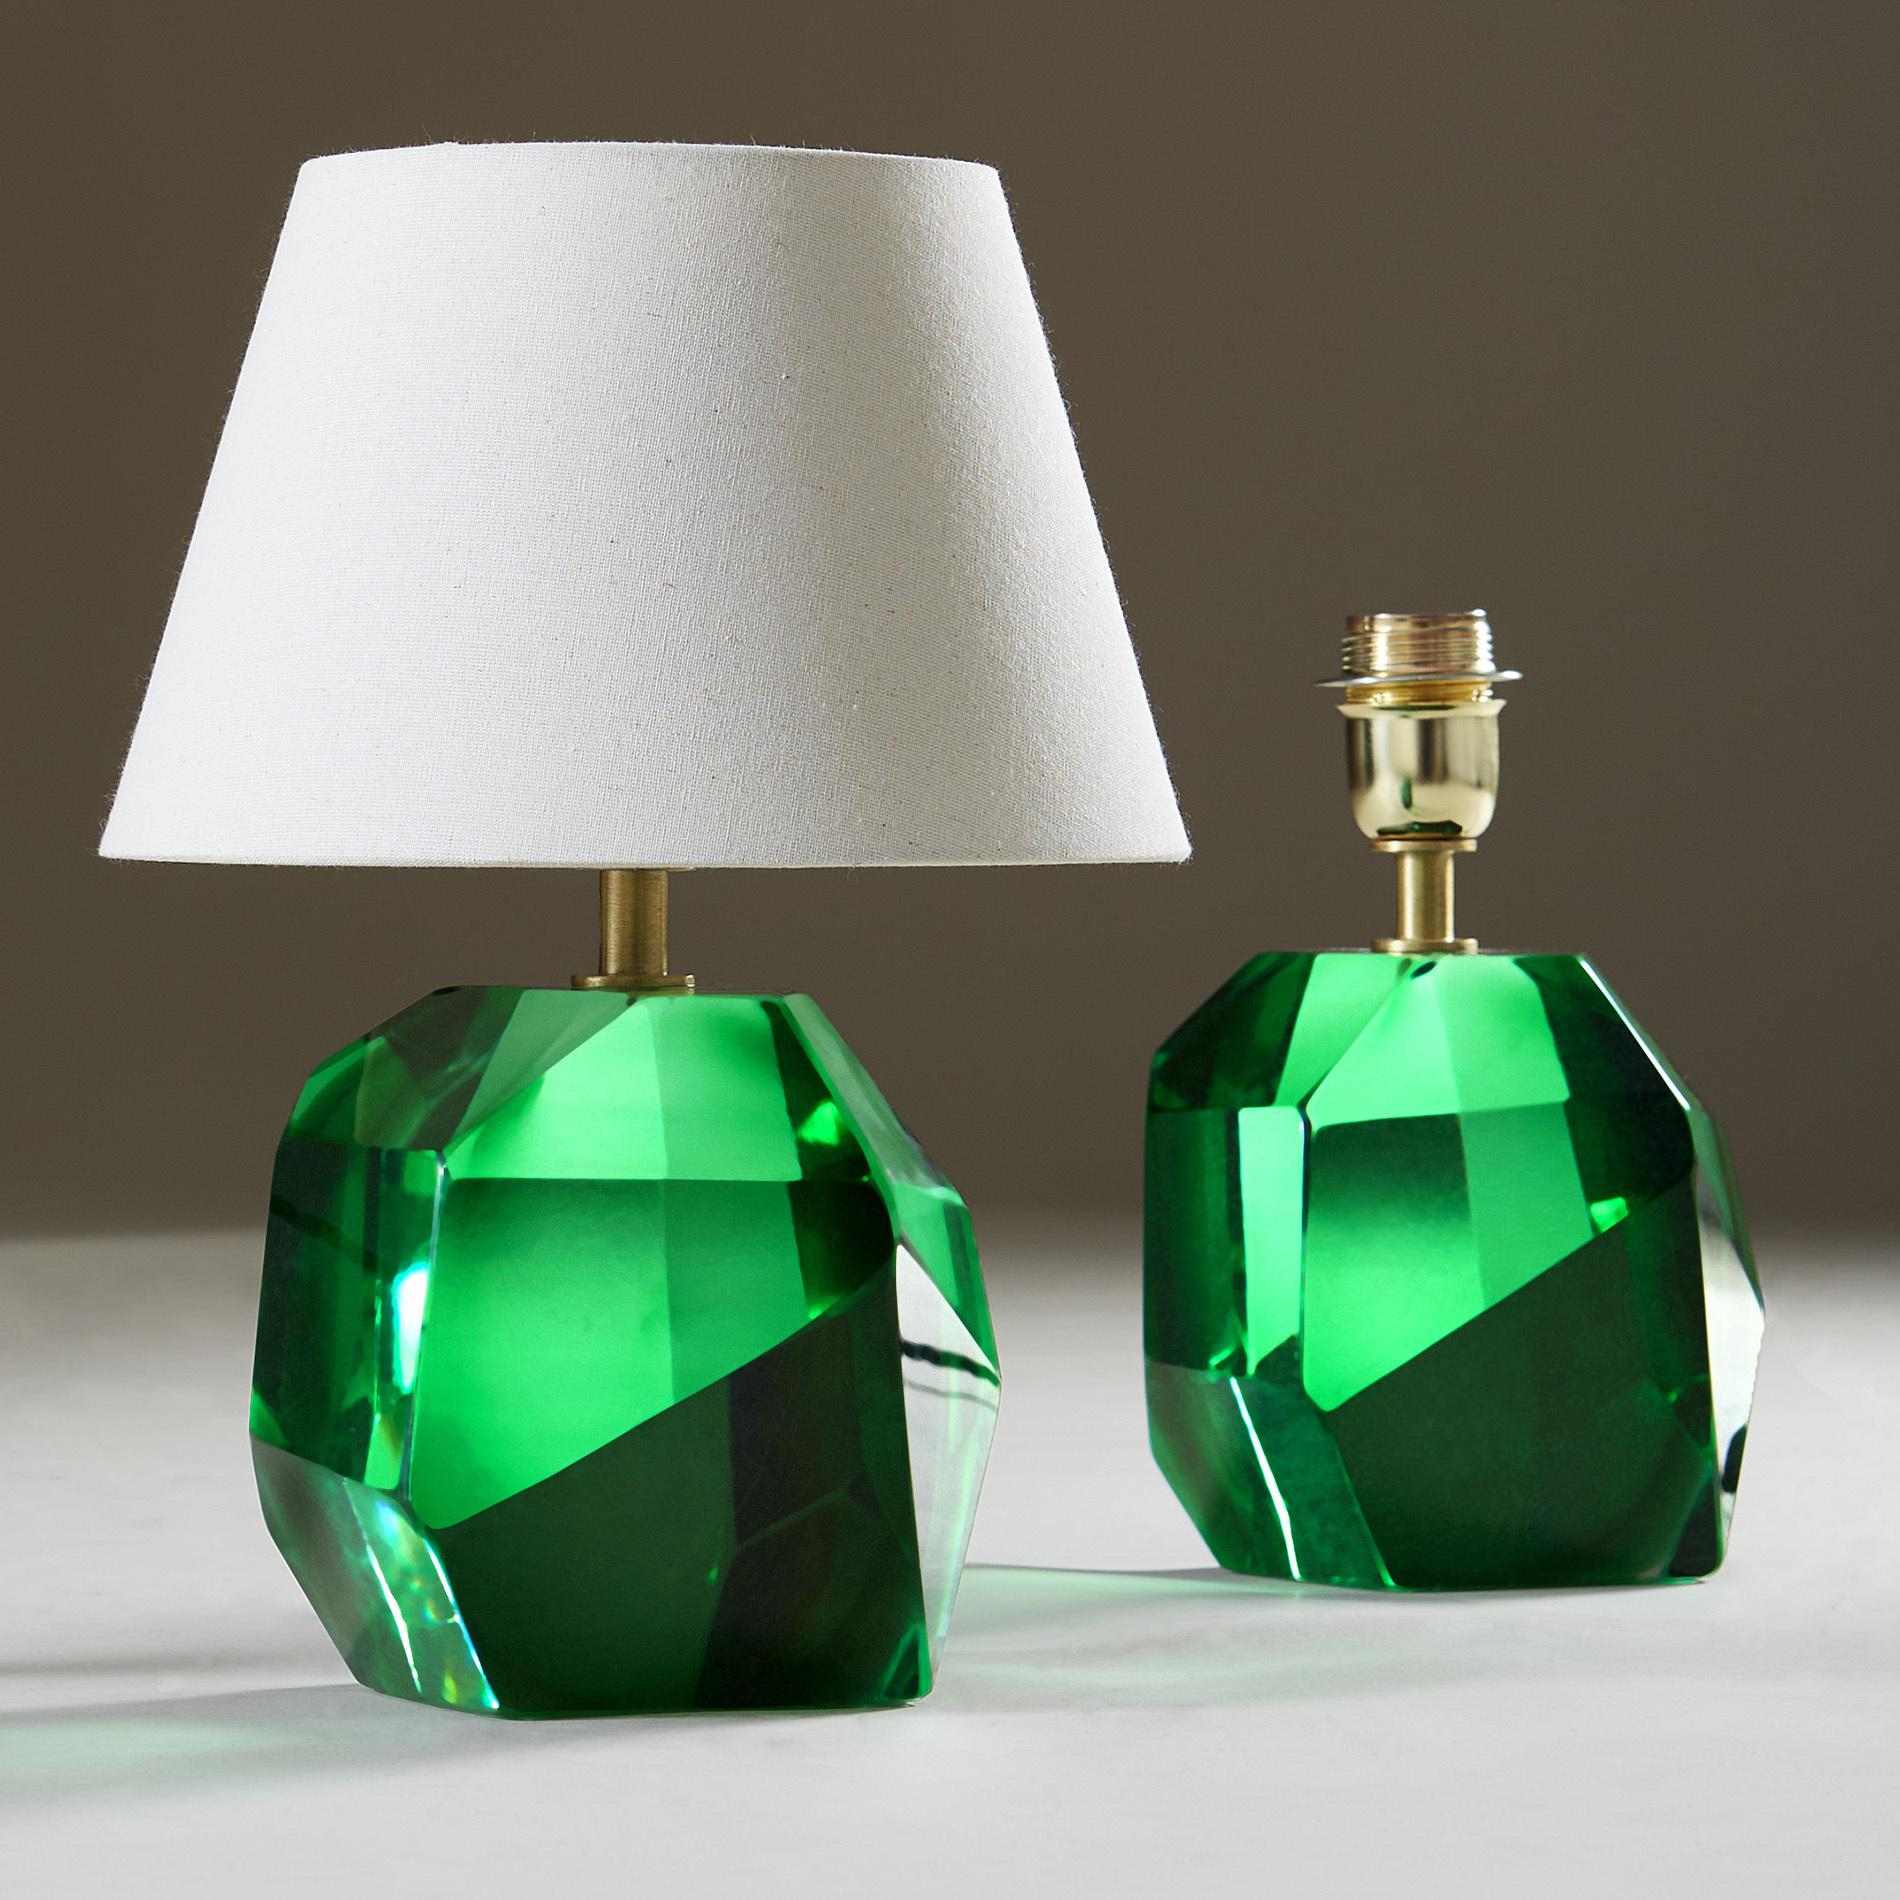 Emerald Green Rock Lamp 20210225 Valerie Wade 2 218 V2